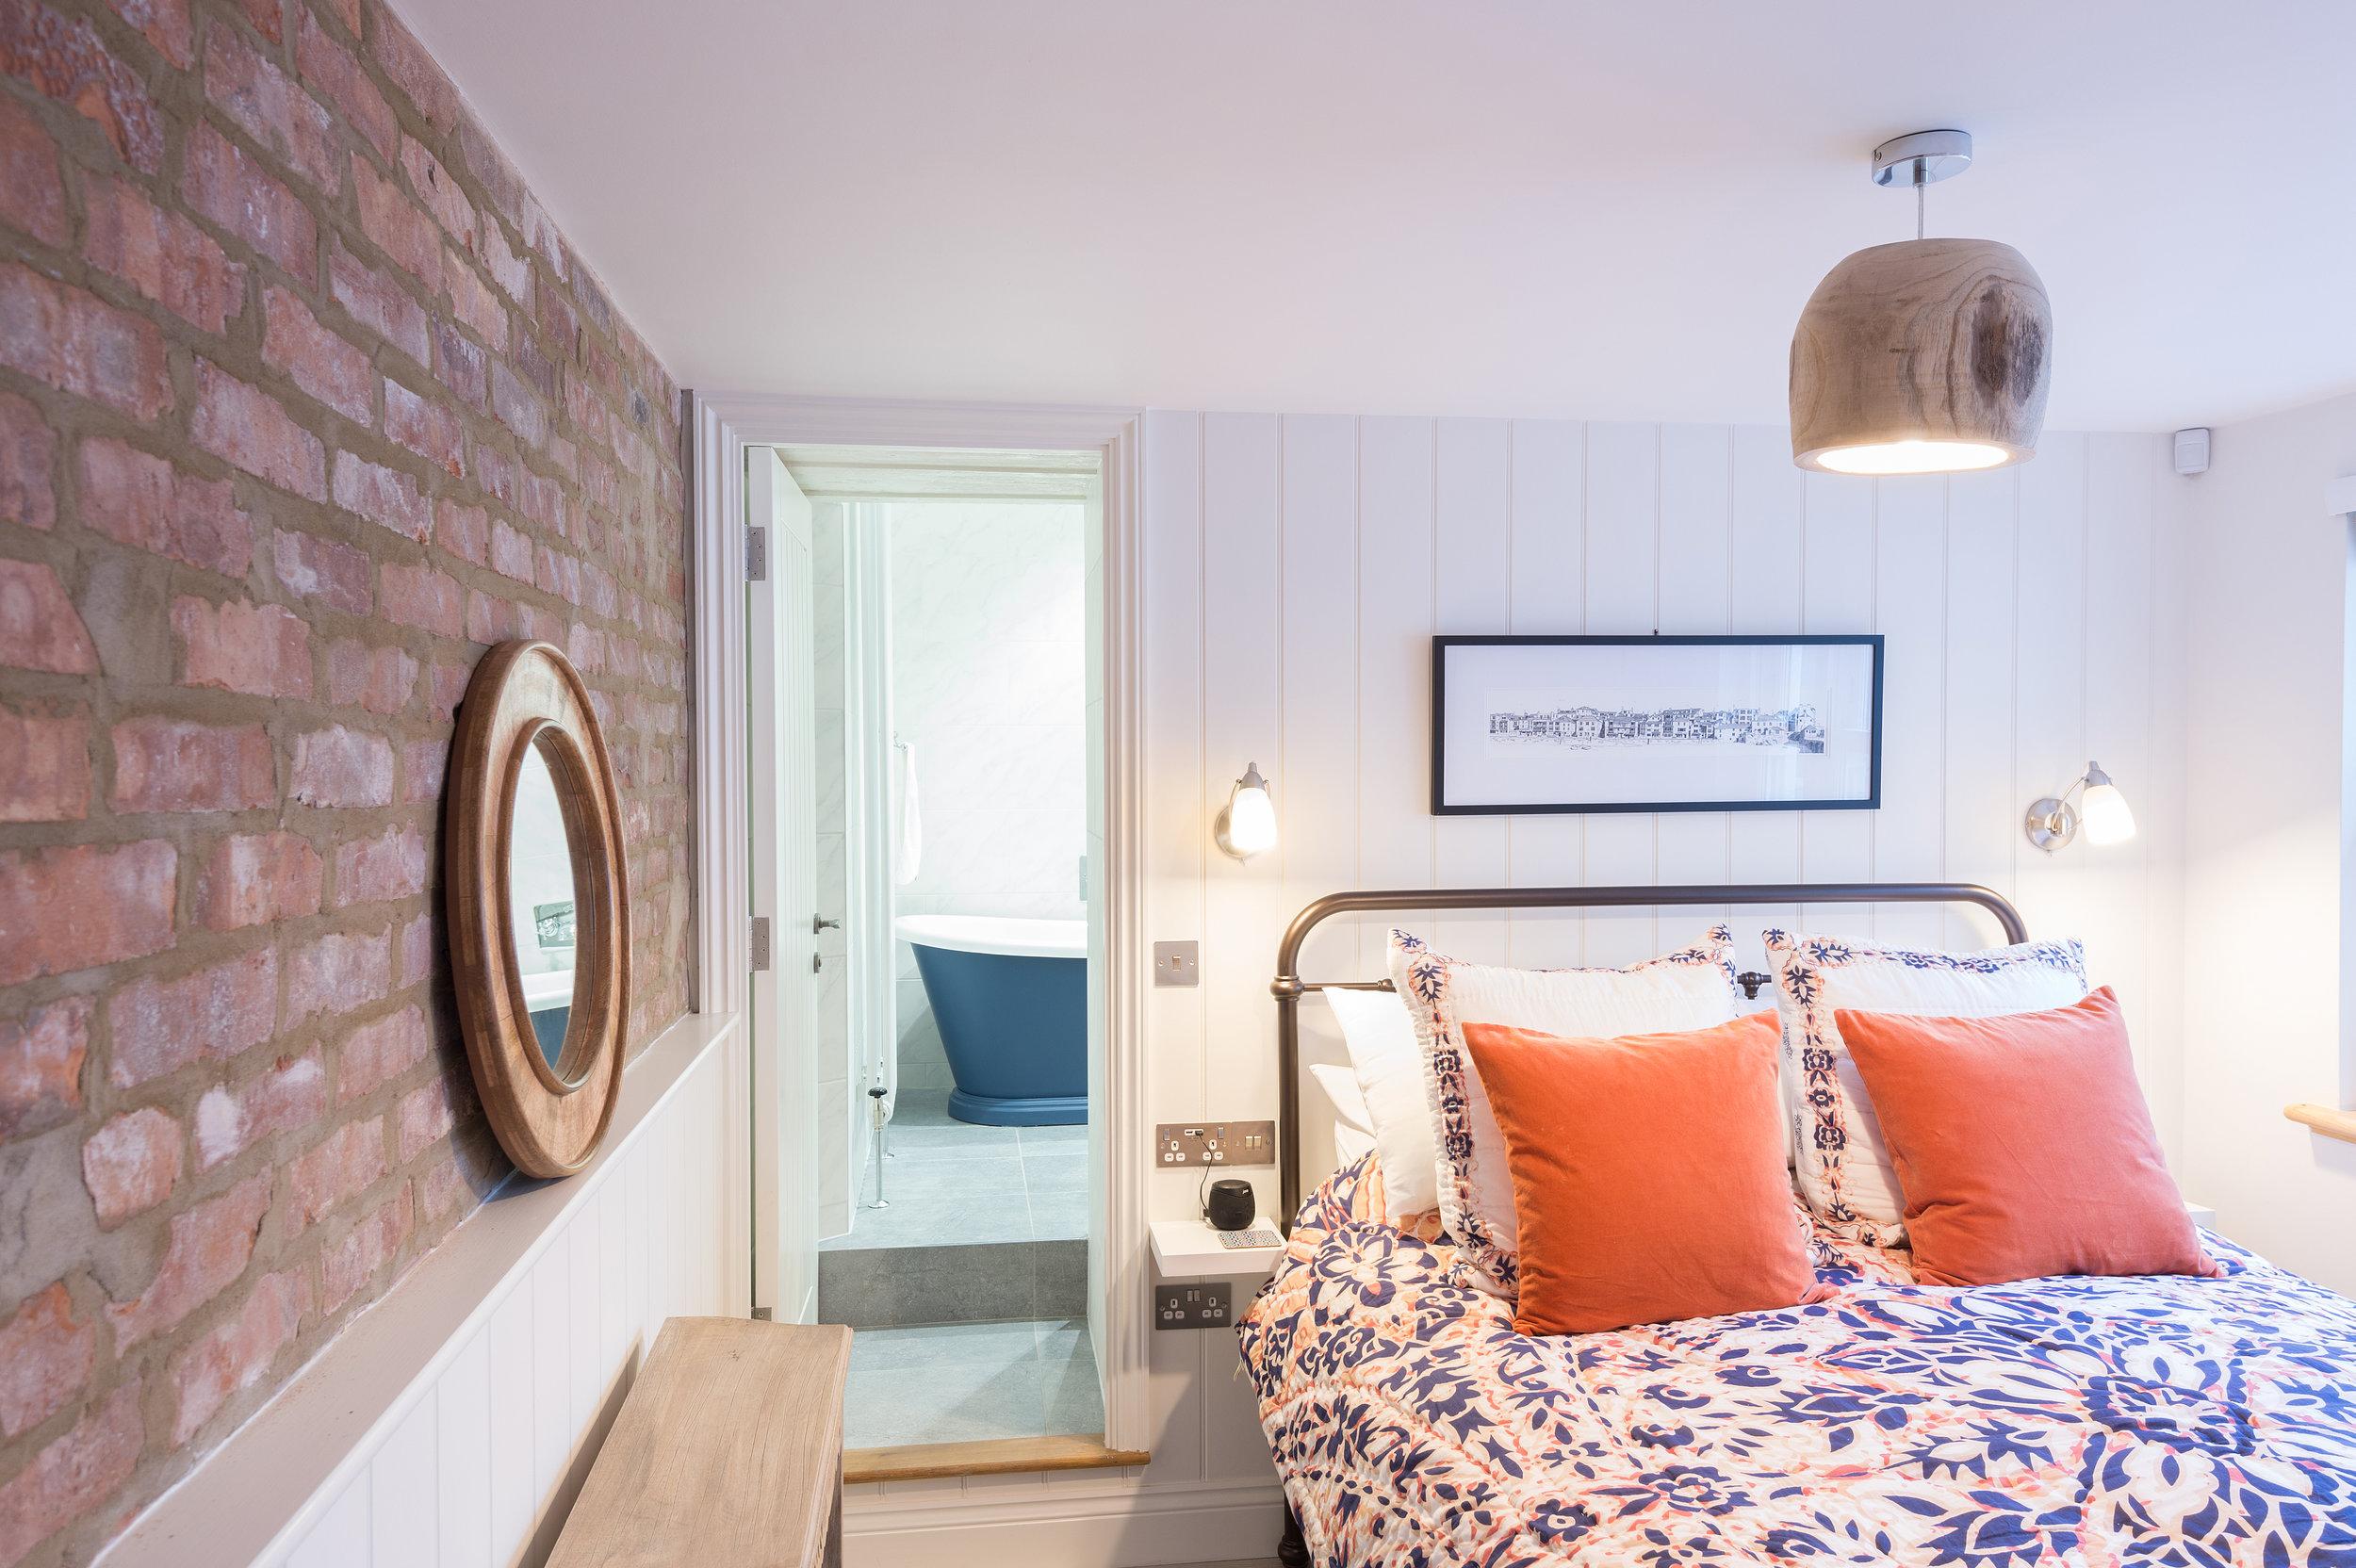 Thimble Cottage - -cornwall-cottage-boutique.co.uk